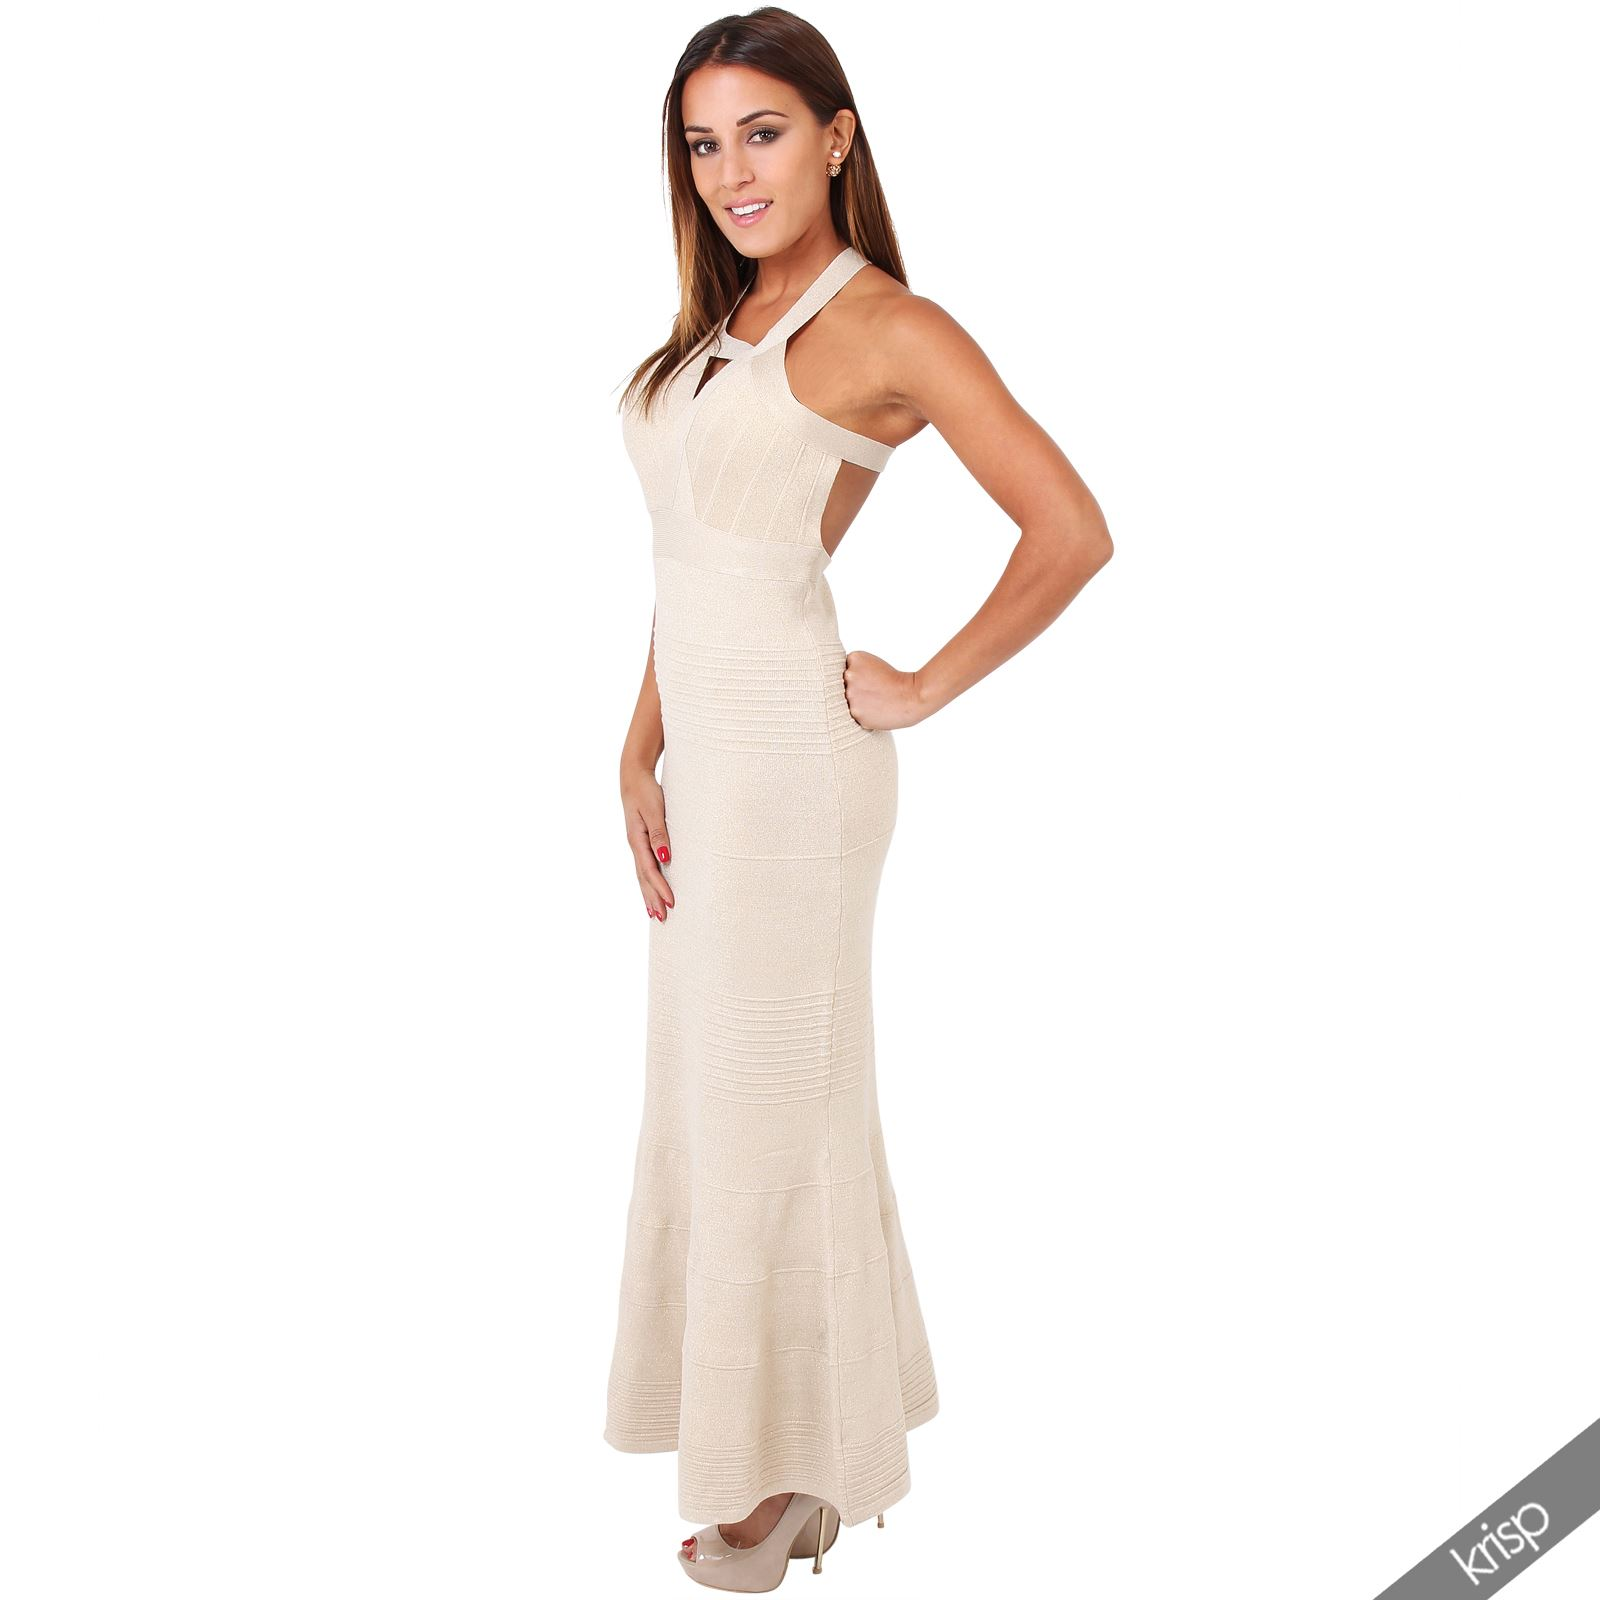 bodycon wedding dress Womens Shiny Strappy Bandage Halterneck Fishtail Bodycon Maxi